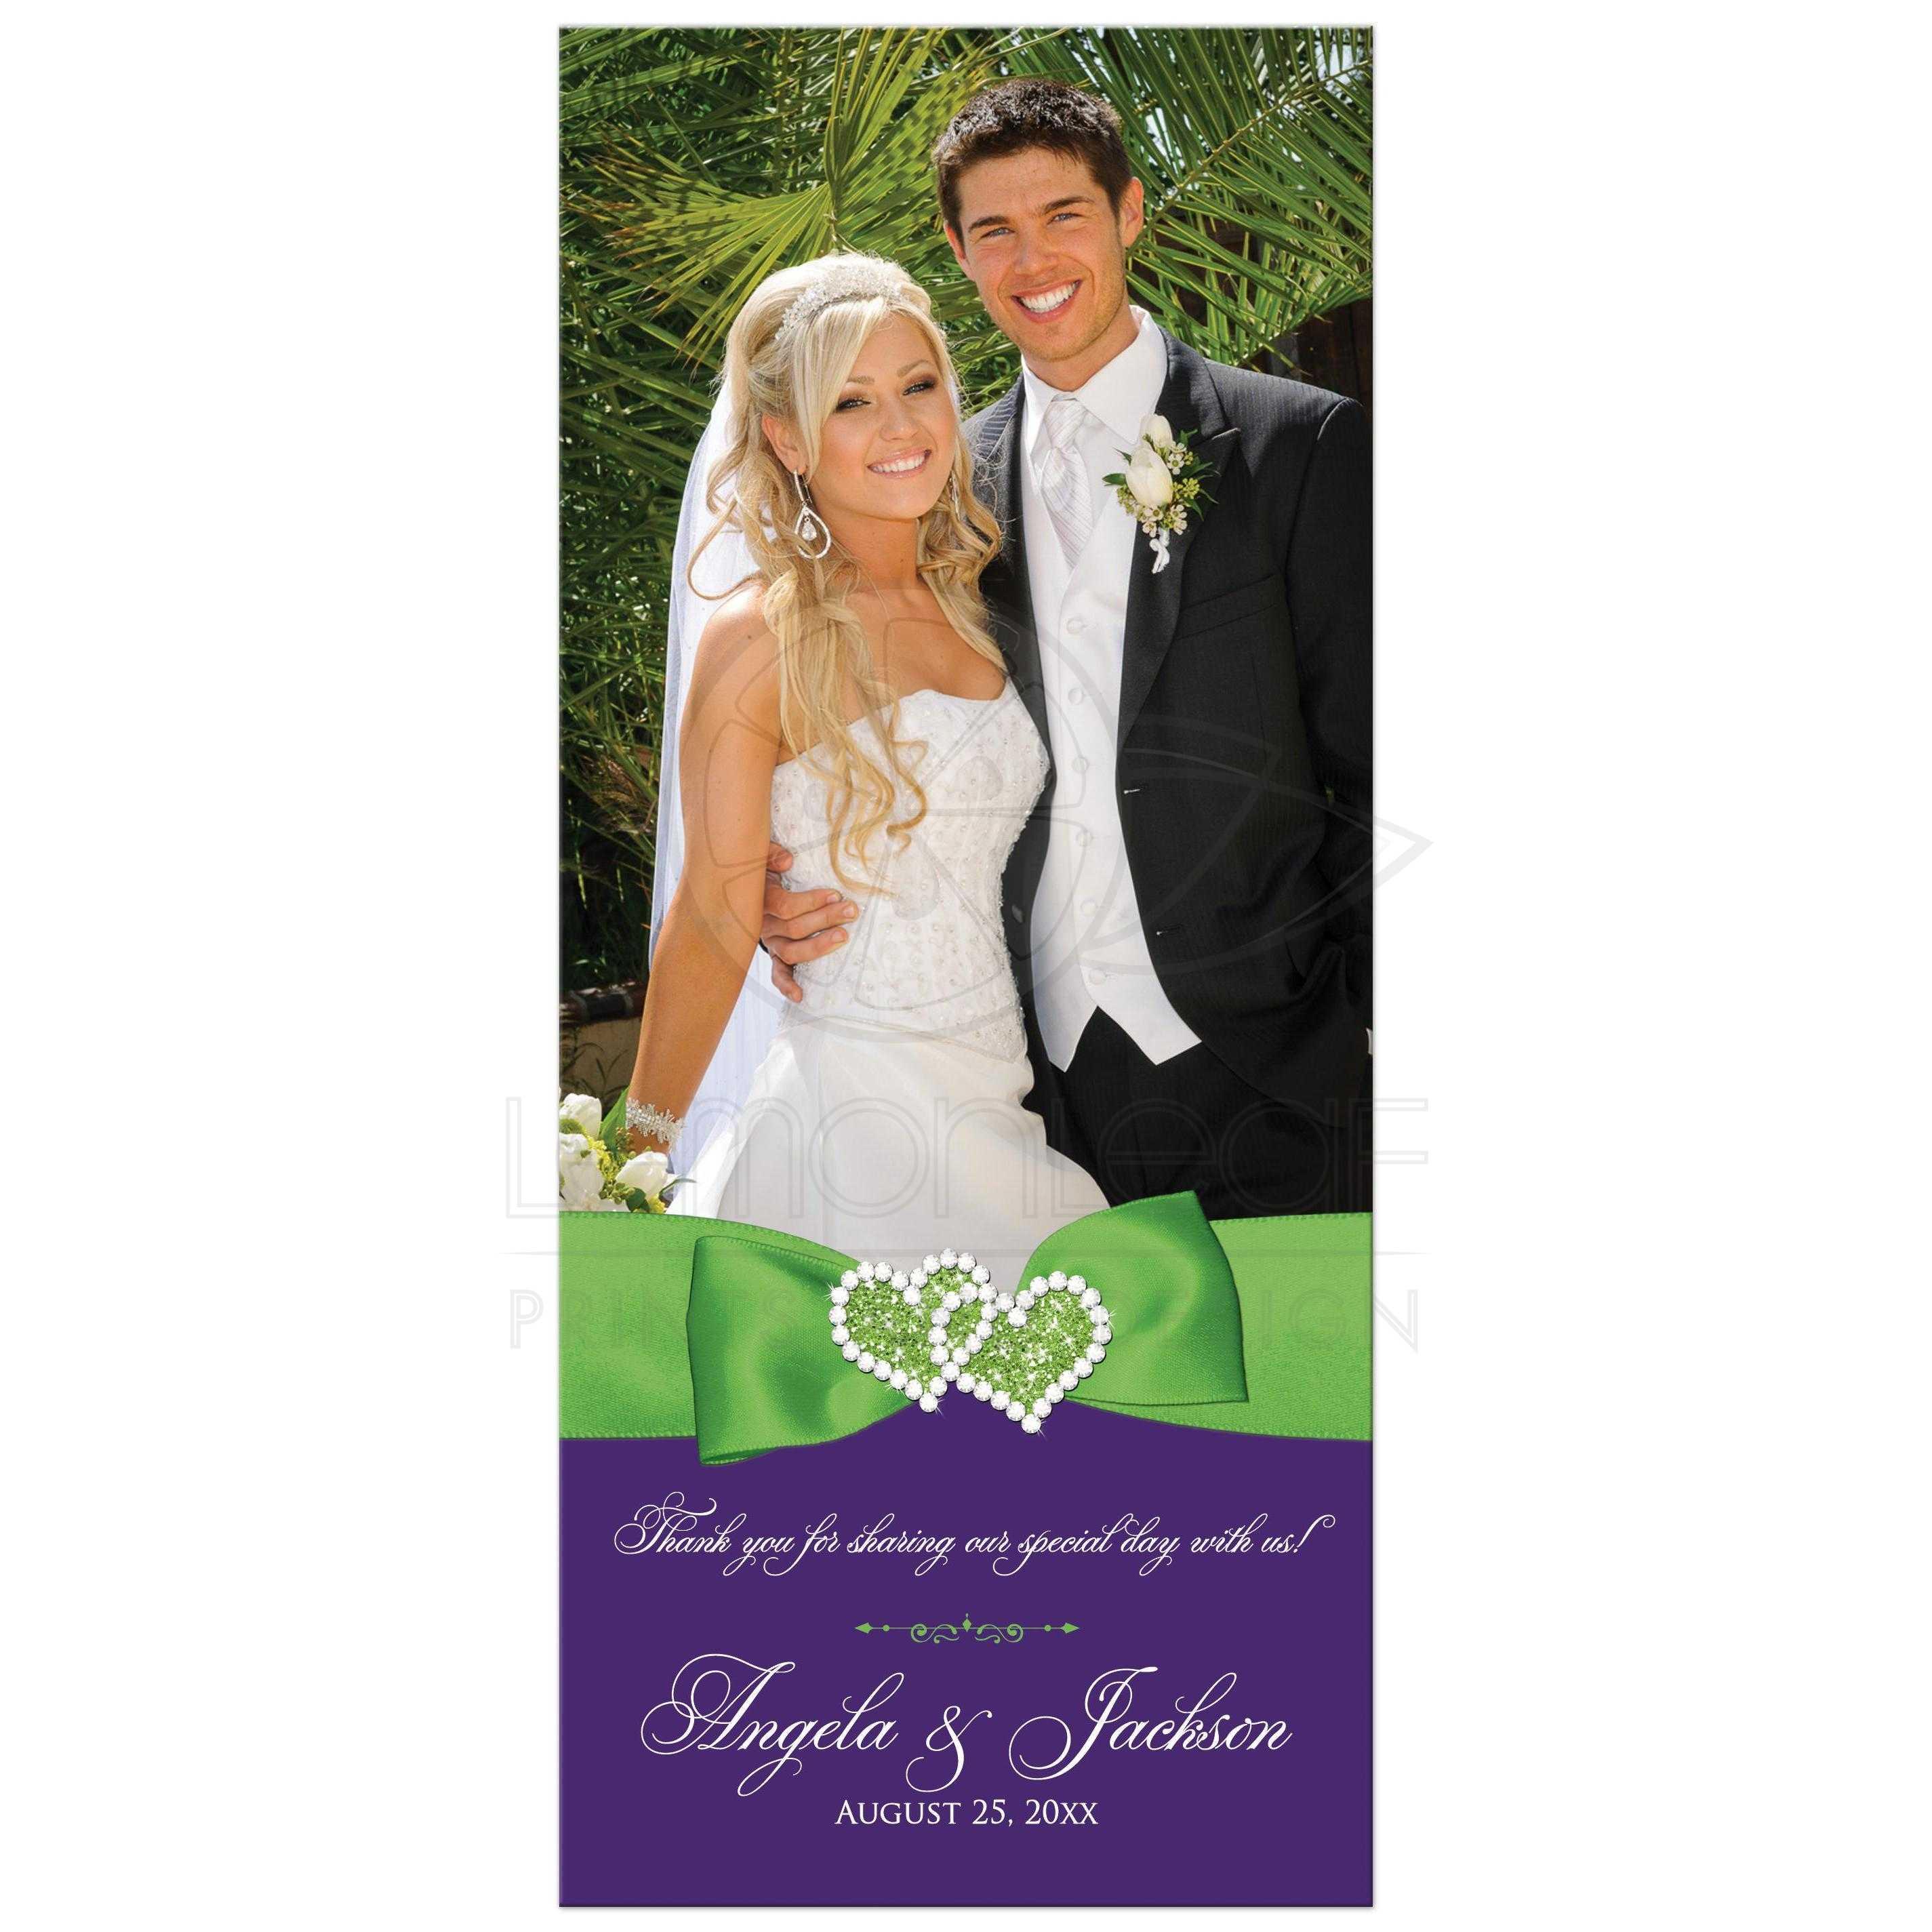 Photo Template Purple Lime White Fl Wedding Thank You Card Flat Printed Jewels Ribbon Glitter Hearts